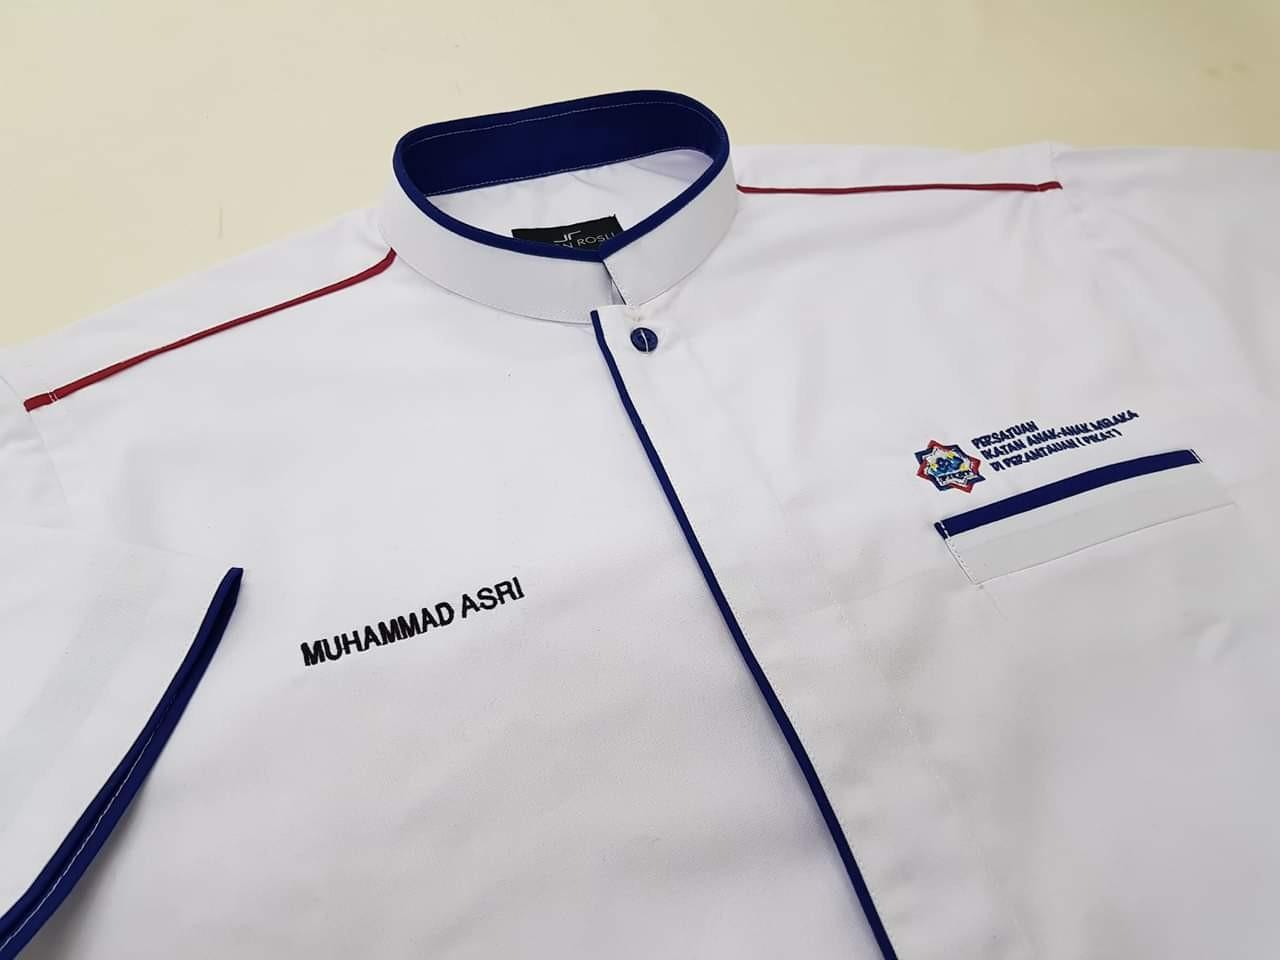 tempahan baju korporat Persatuan Anak-Anak Melaka Di Perantauan (Pikat)